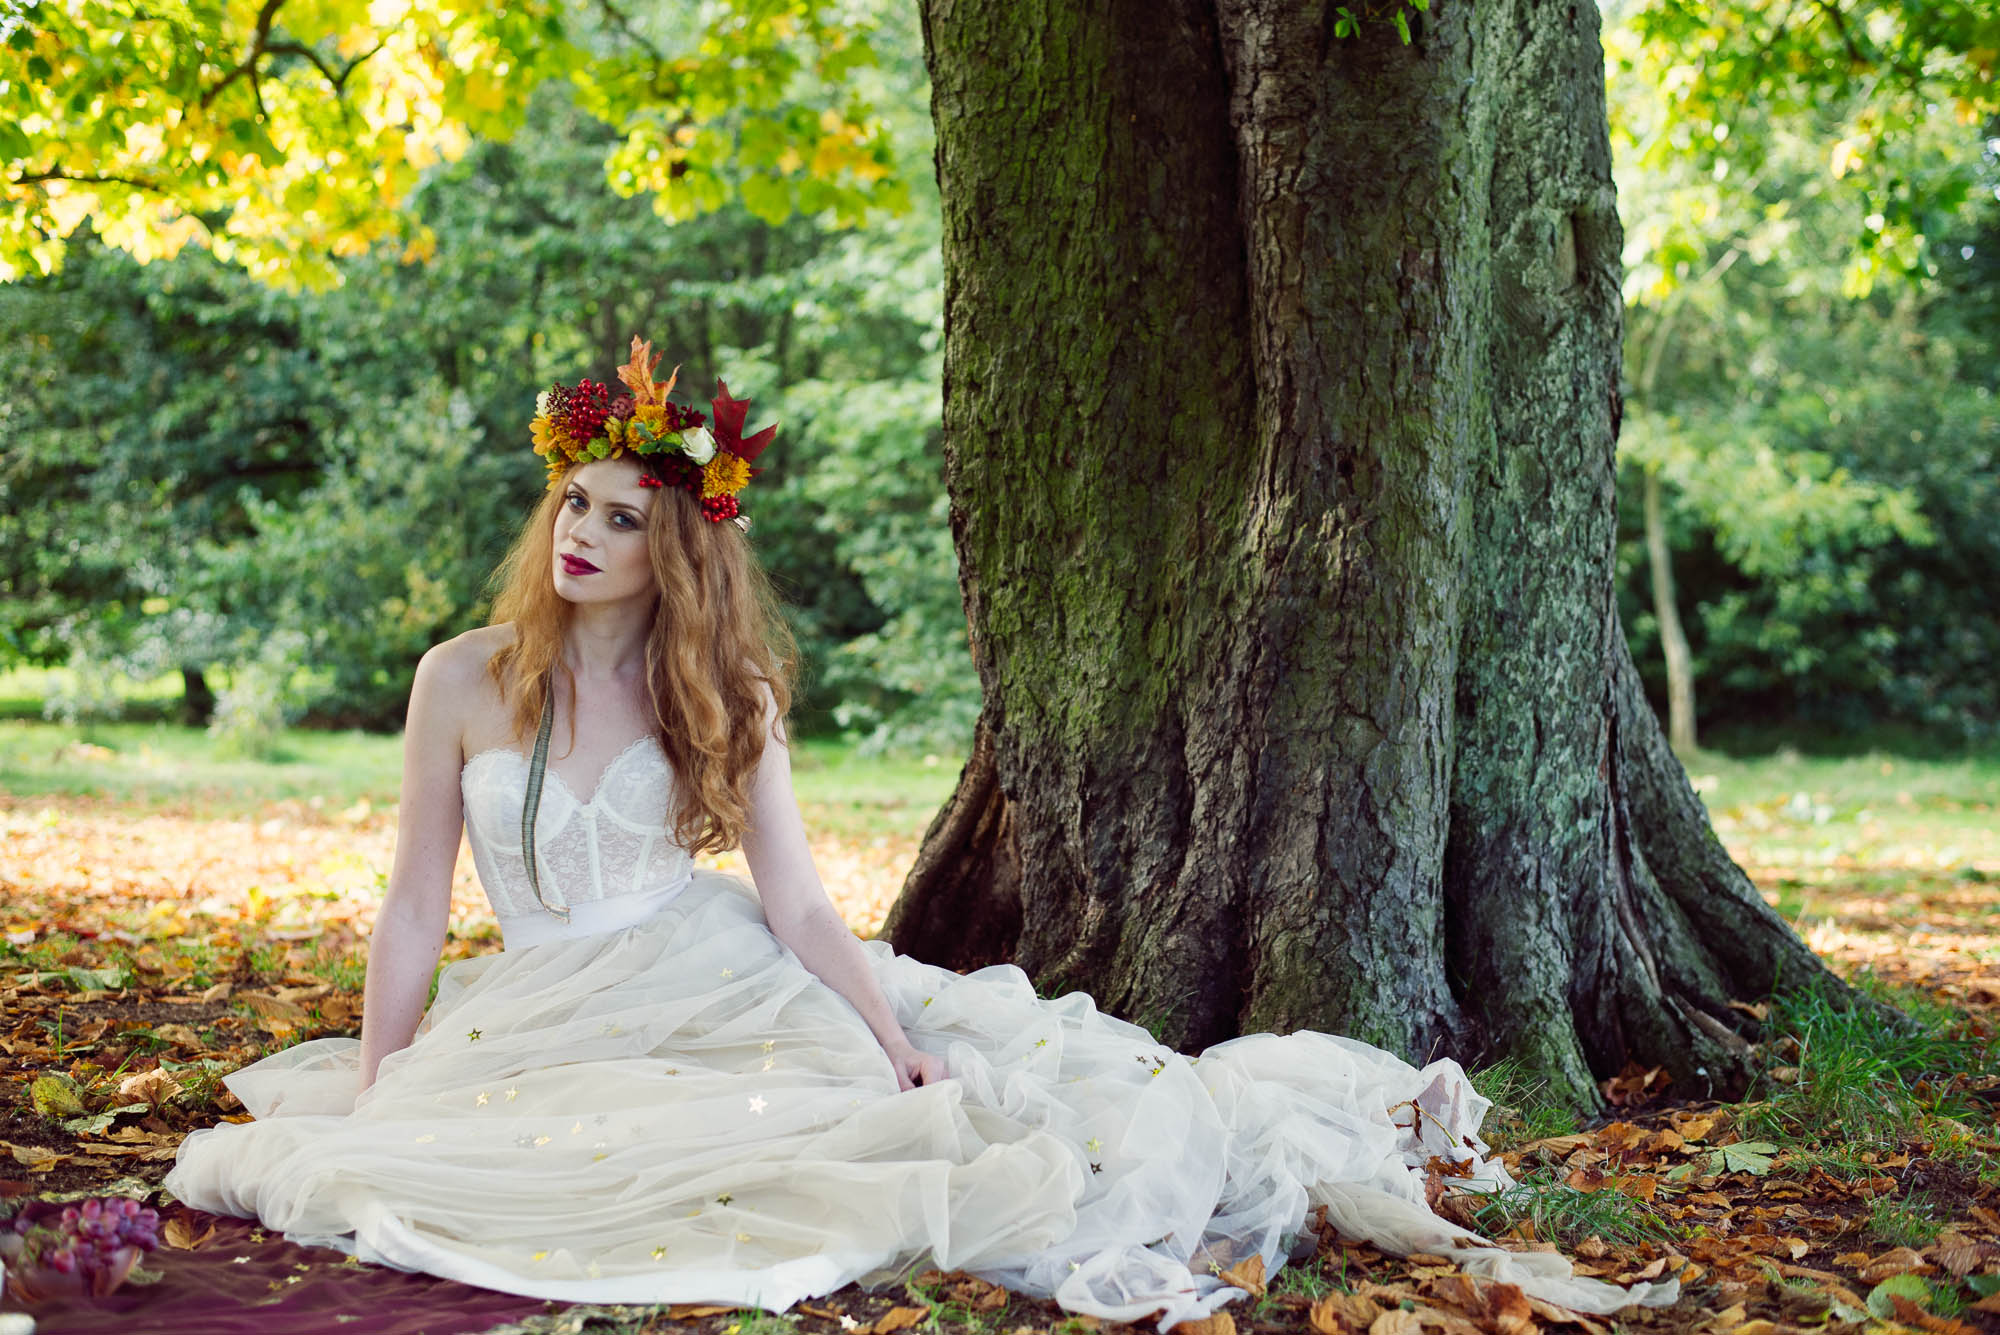 AutumnWedding_NikkiCooper-4.jpg